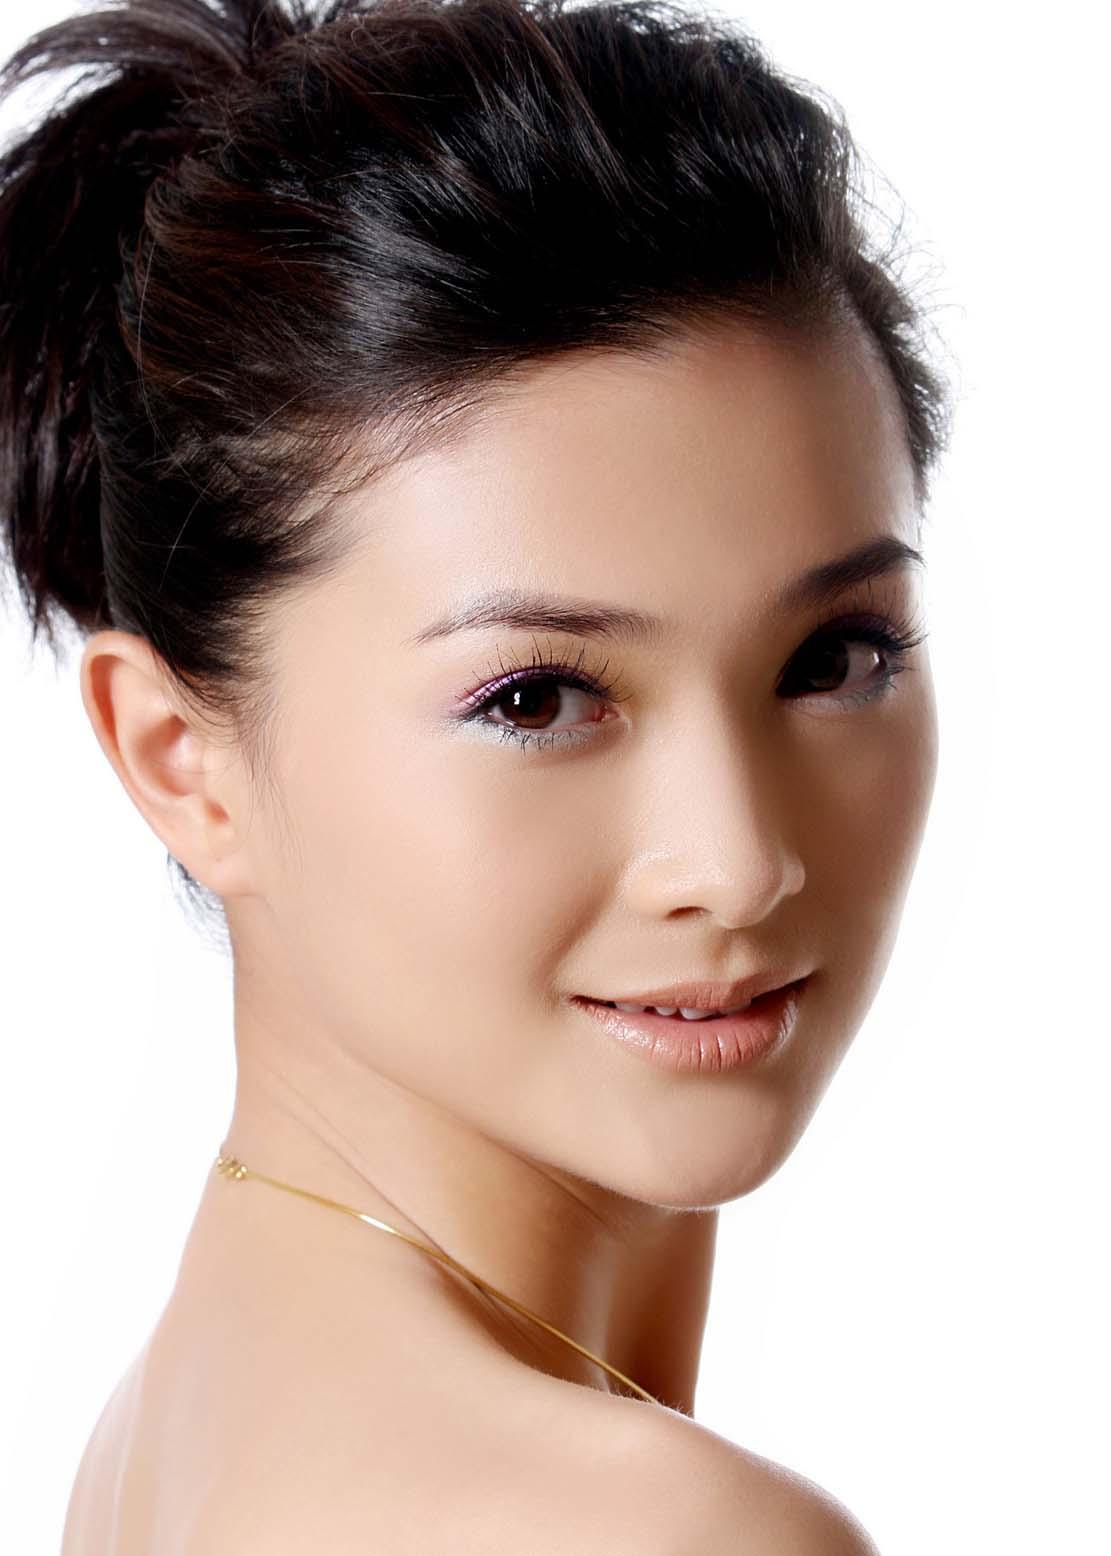 girl hd Asian